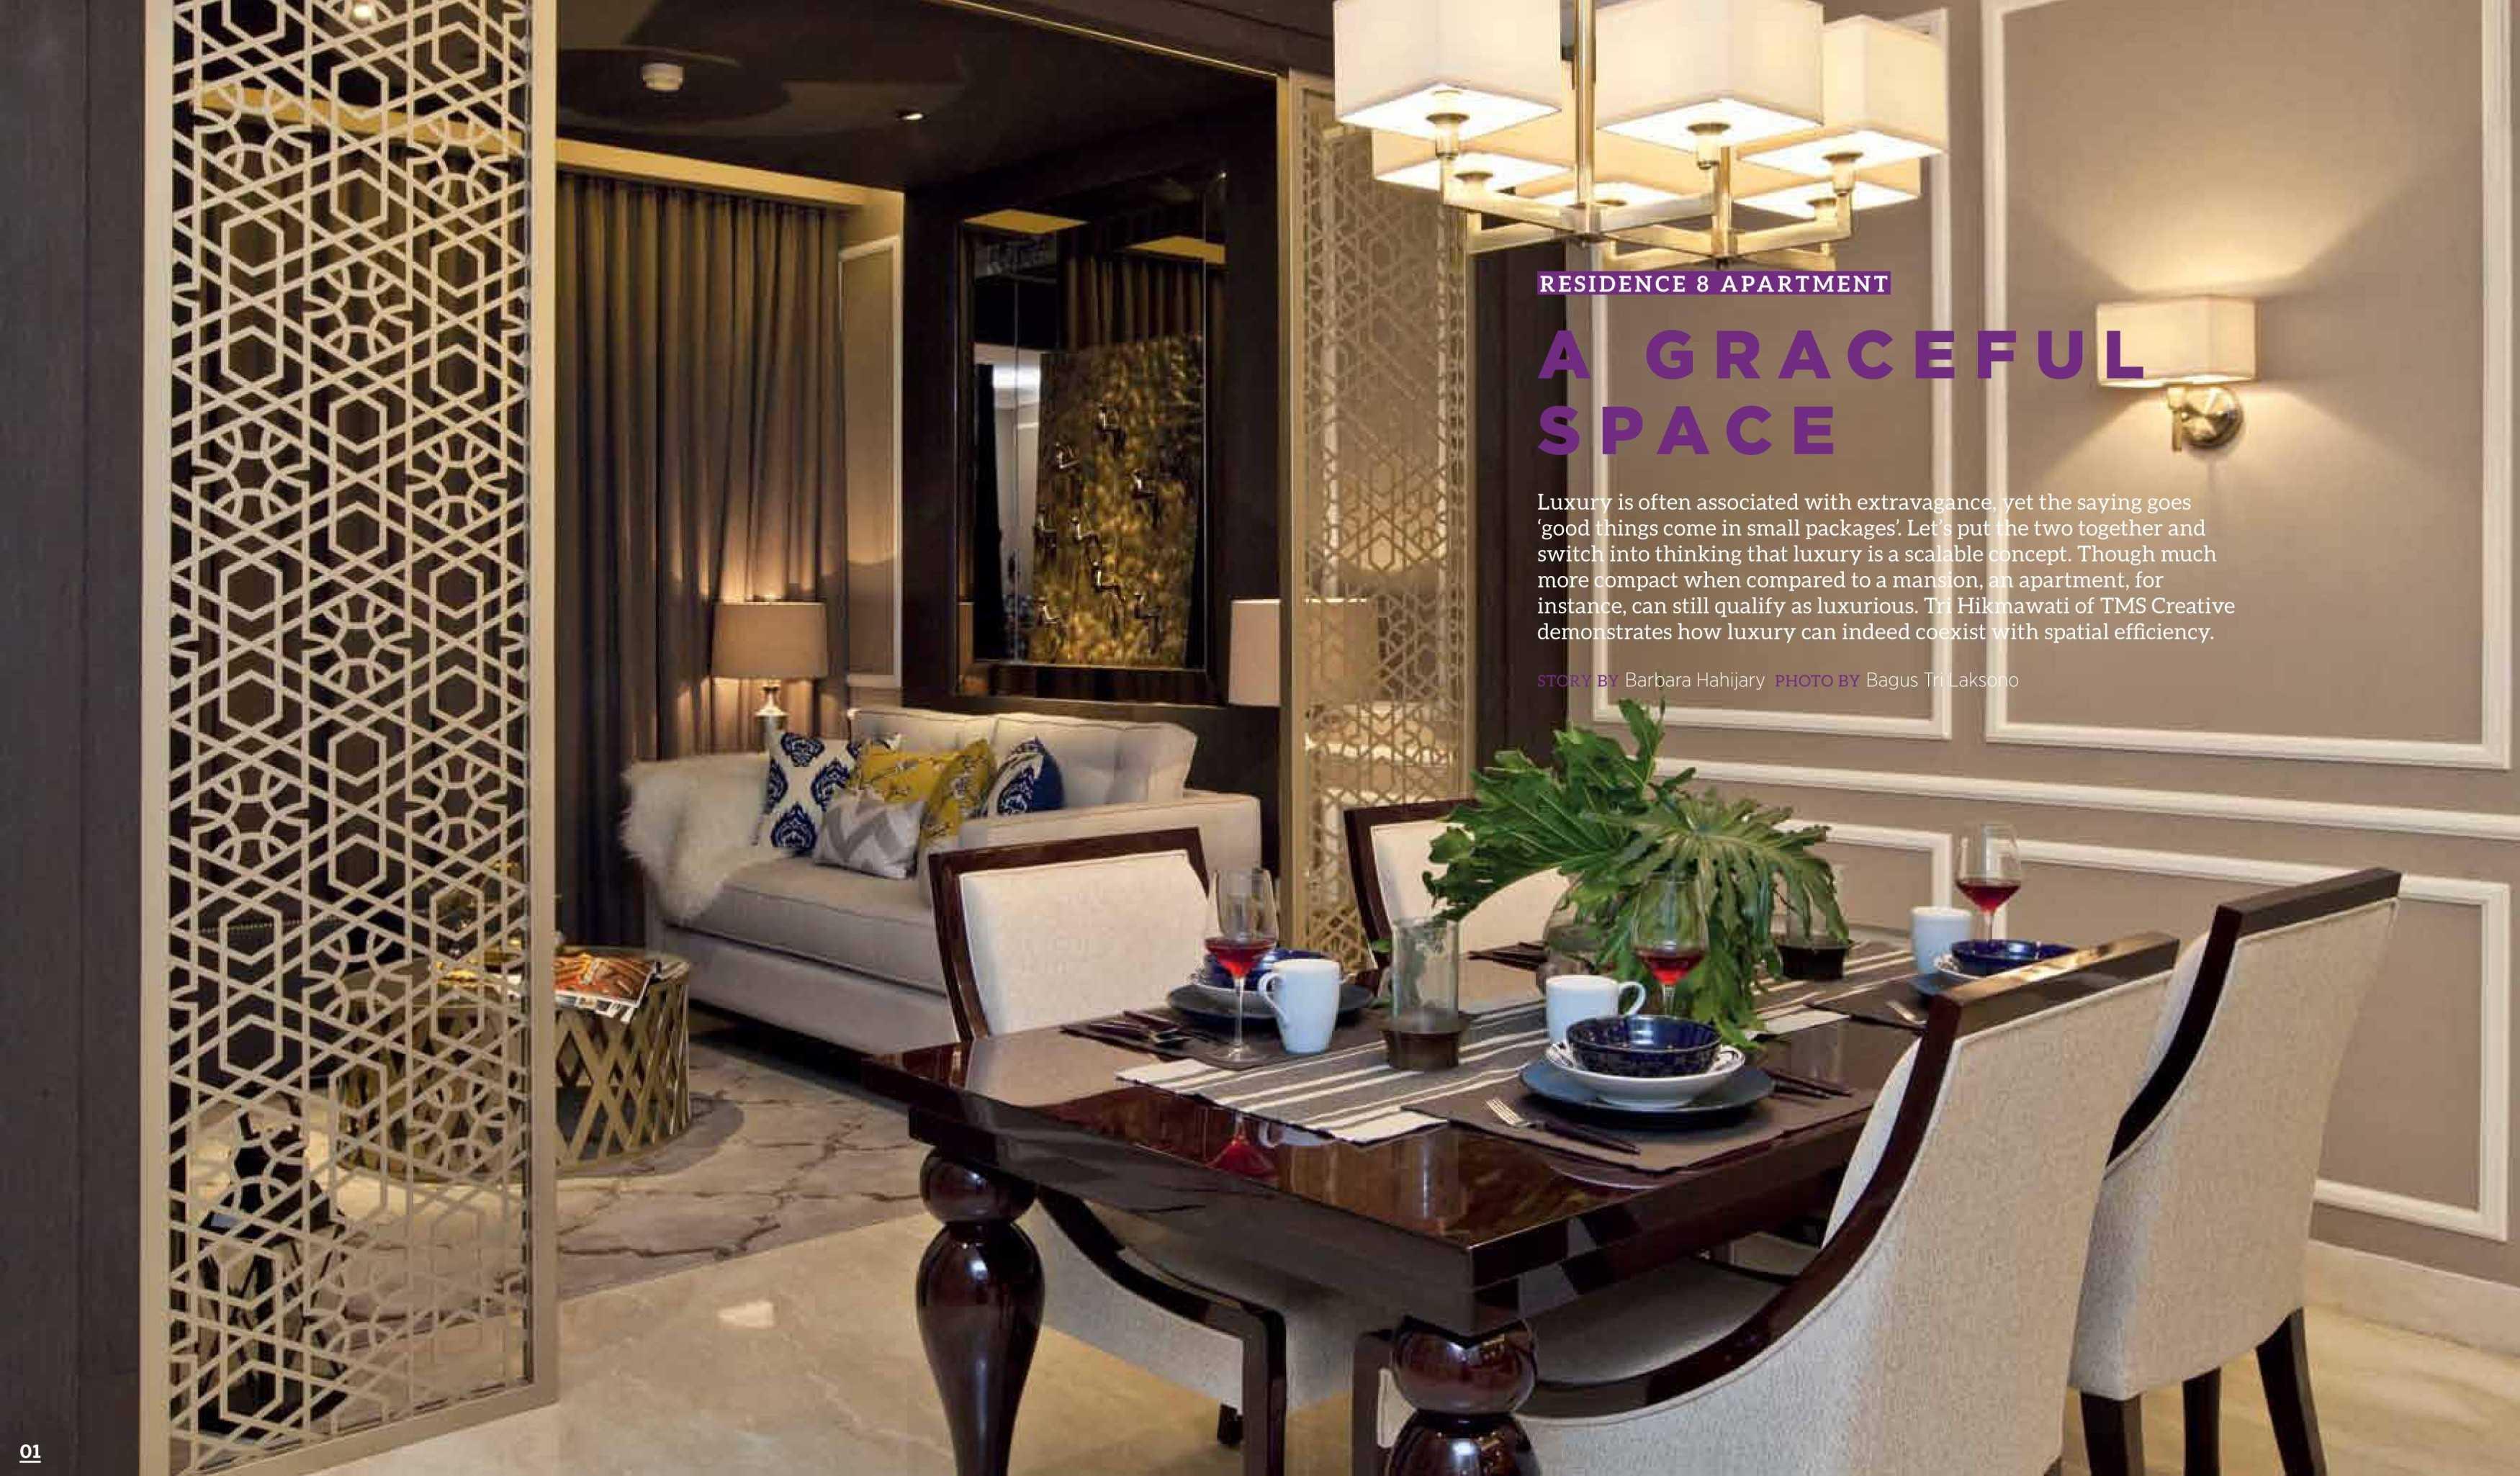 Tms Creative Residence 8 - T2 Senopati Raya No. 88 South Jakarta 12190 Senopati Raya No. 88 South Jakarta 12190 201606Id-Residence-8Final-1   41072